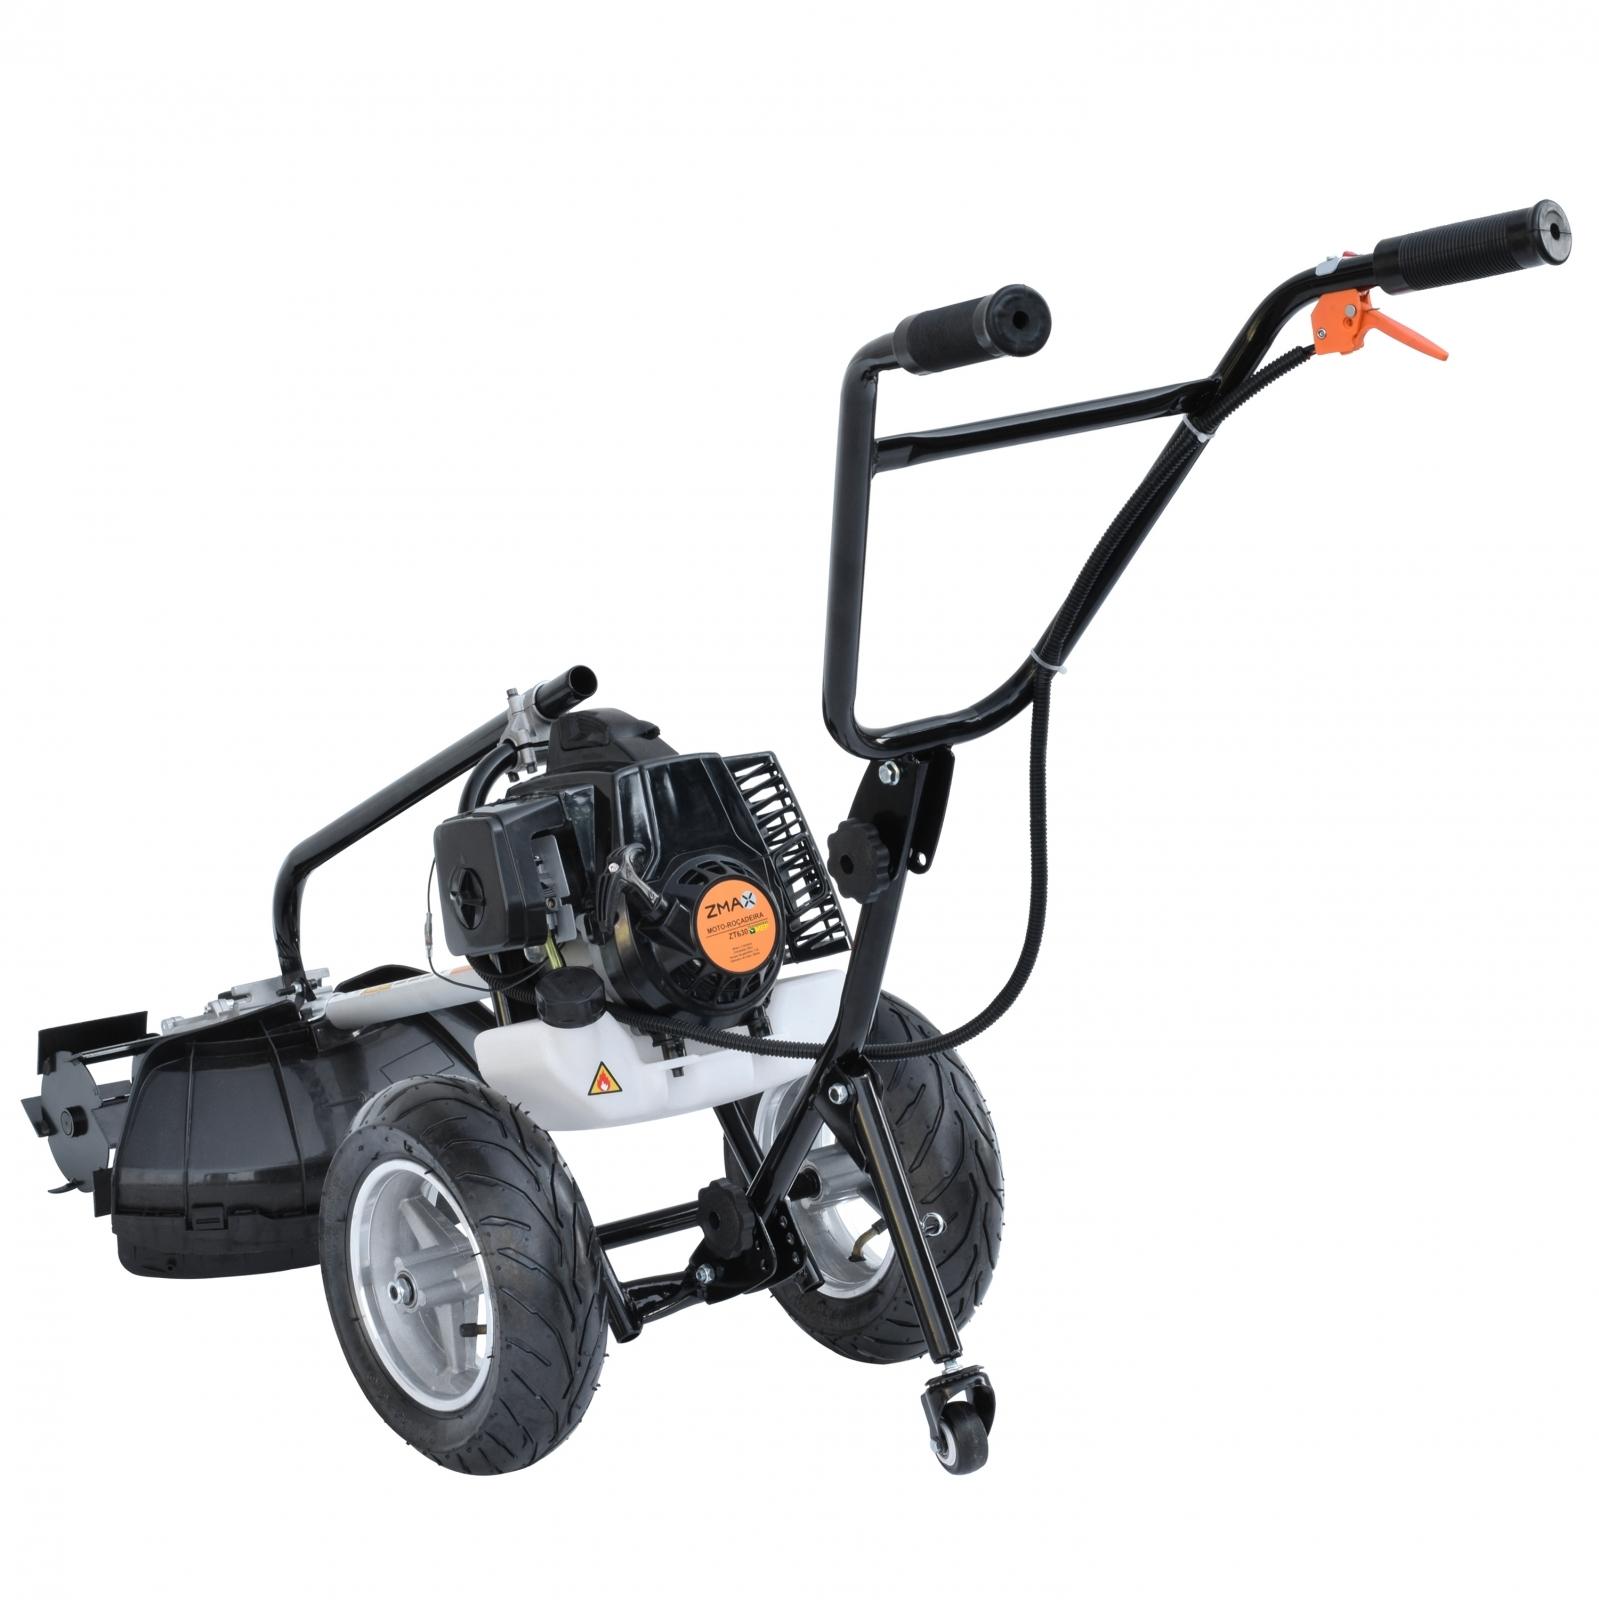 Motocultivador Multifuncional À Gasolina Zmax ZT-630 Lamina Reta - Er8 - Ferramentas MEP